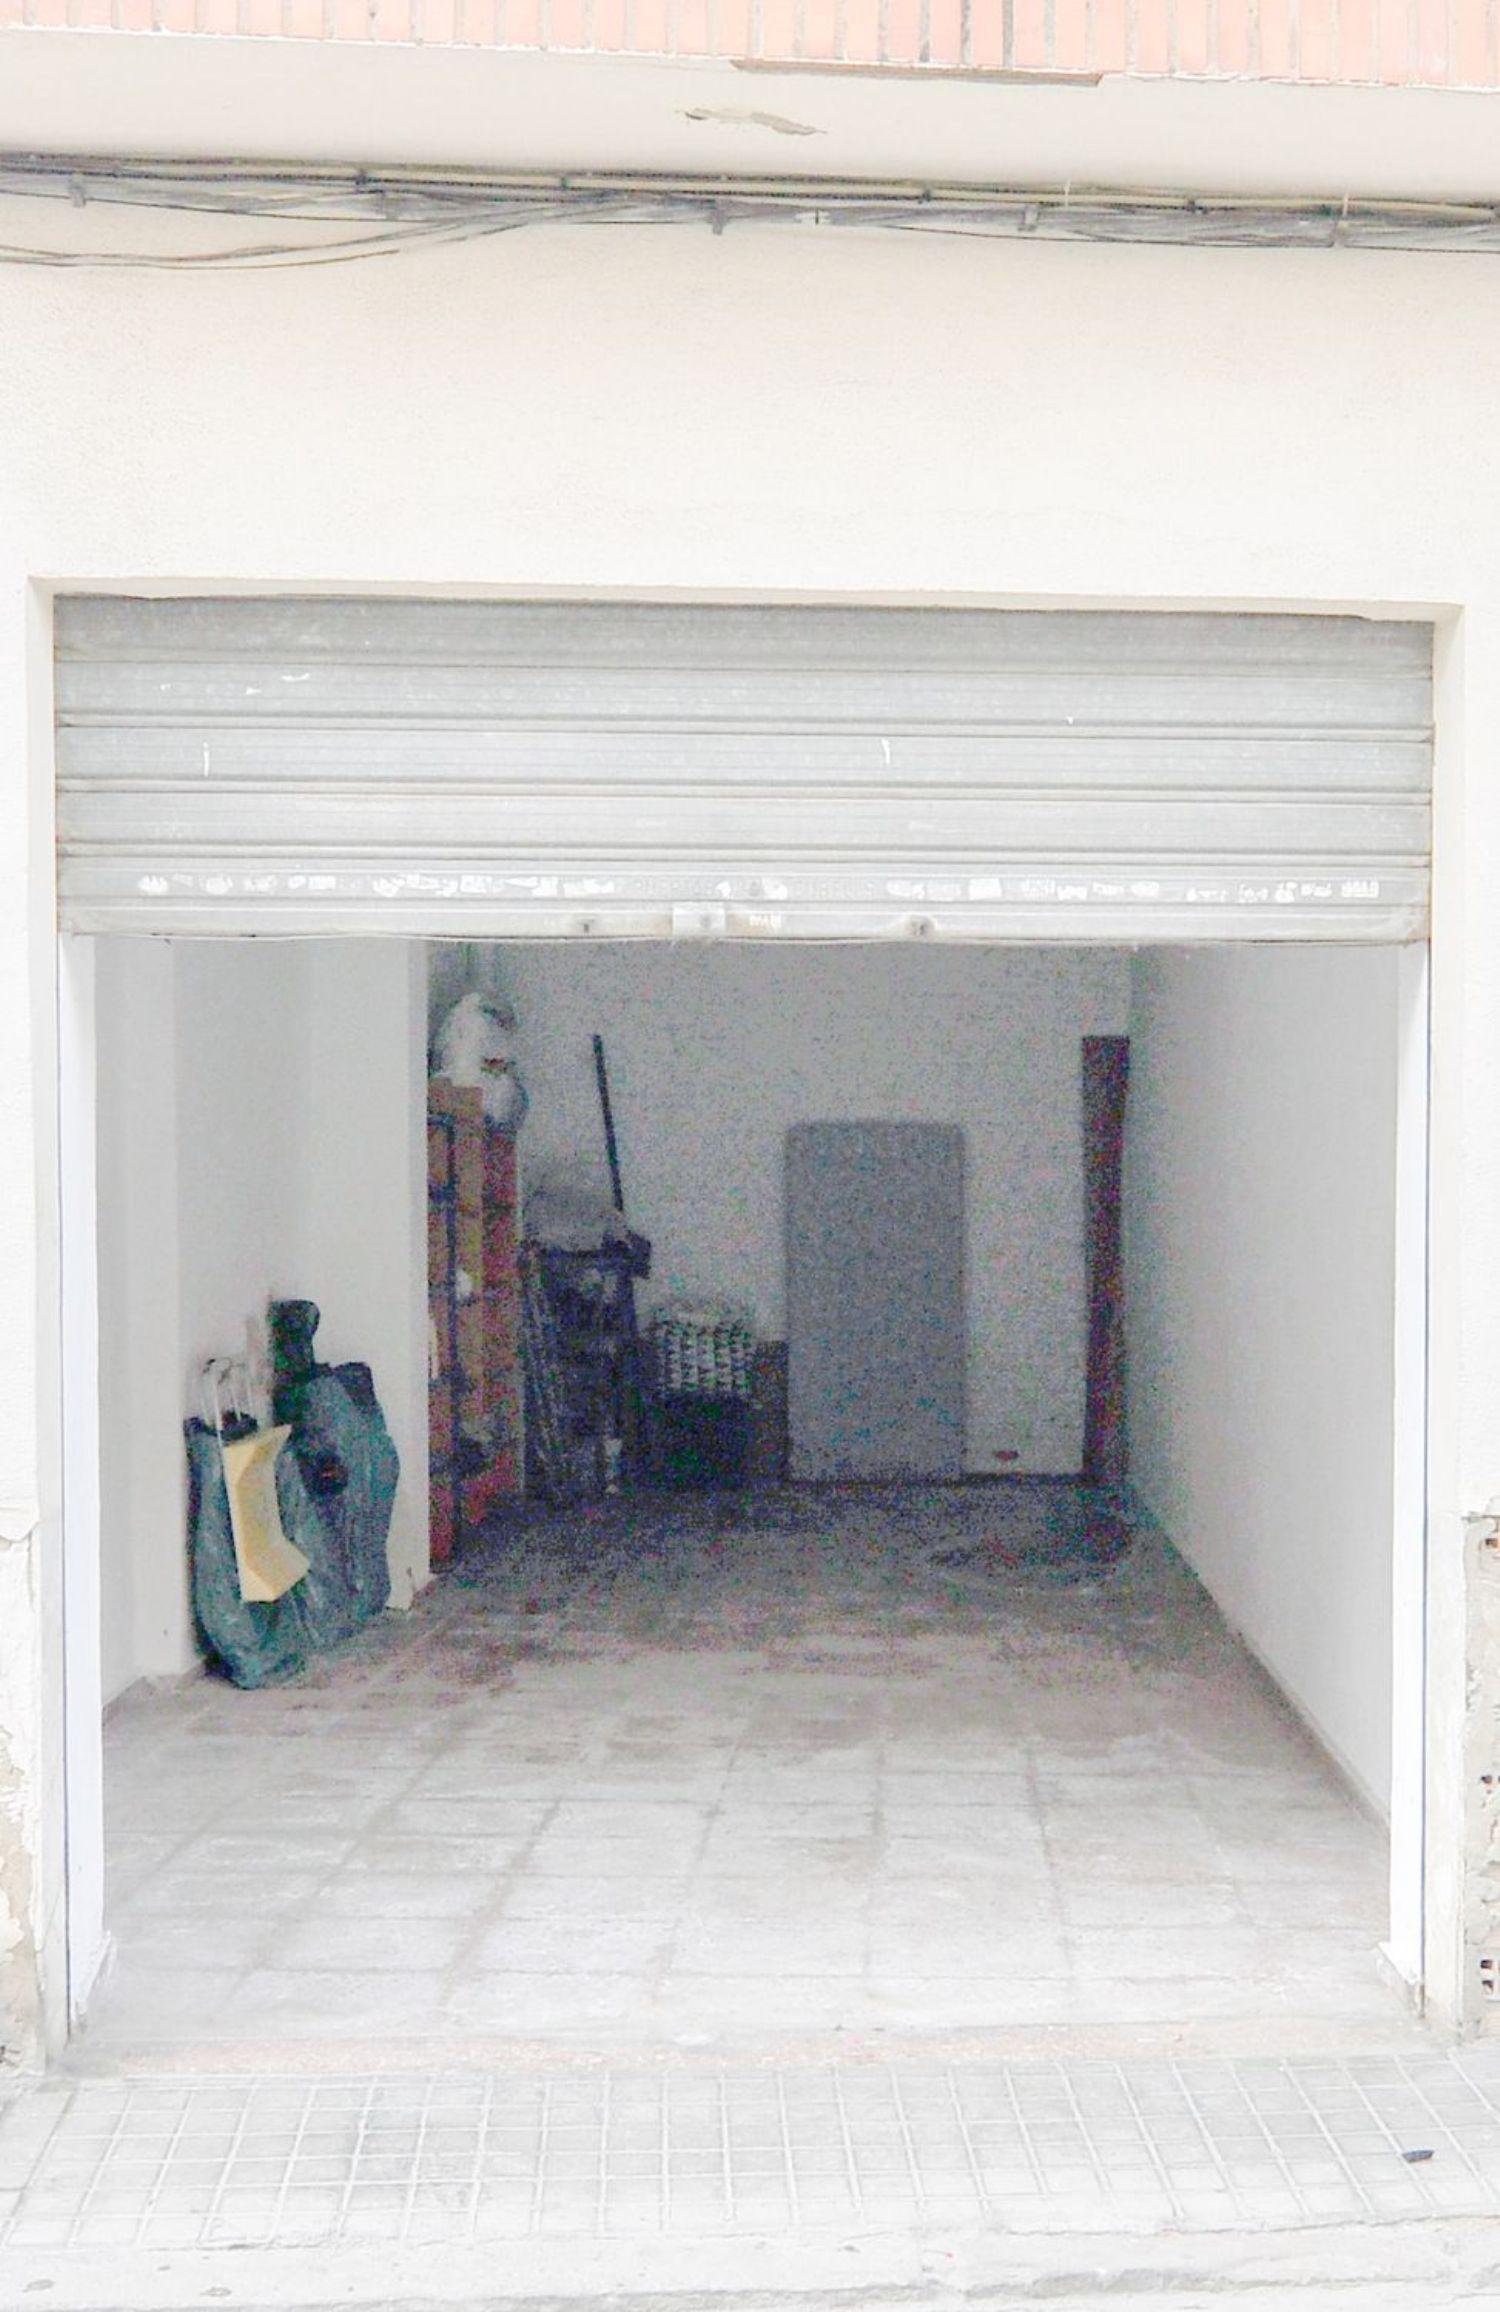 https://img3.idealista.com/blur/HOME_WI_1500/0/id.pro.es.image.master/d1/37/75/211860910.jpg